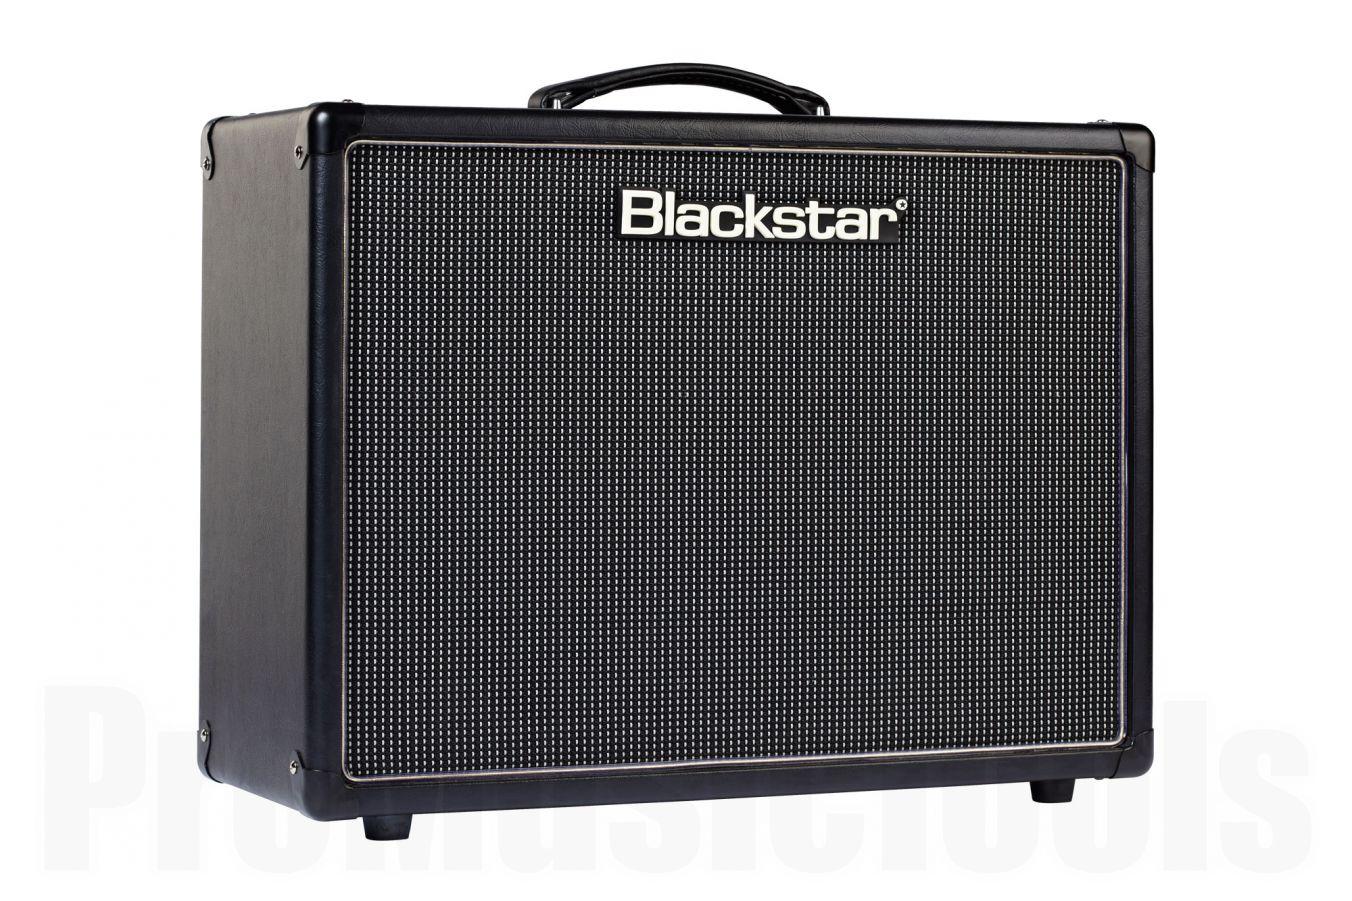 Blackstar HT-5210 Combo